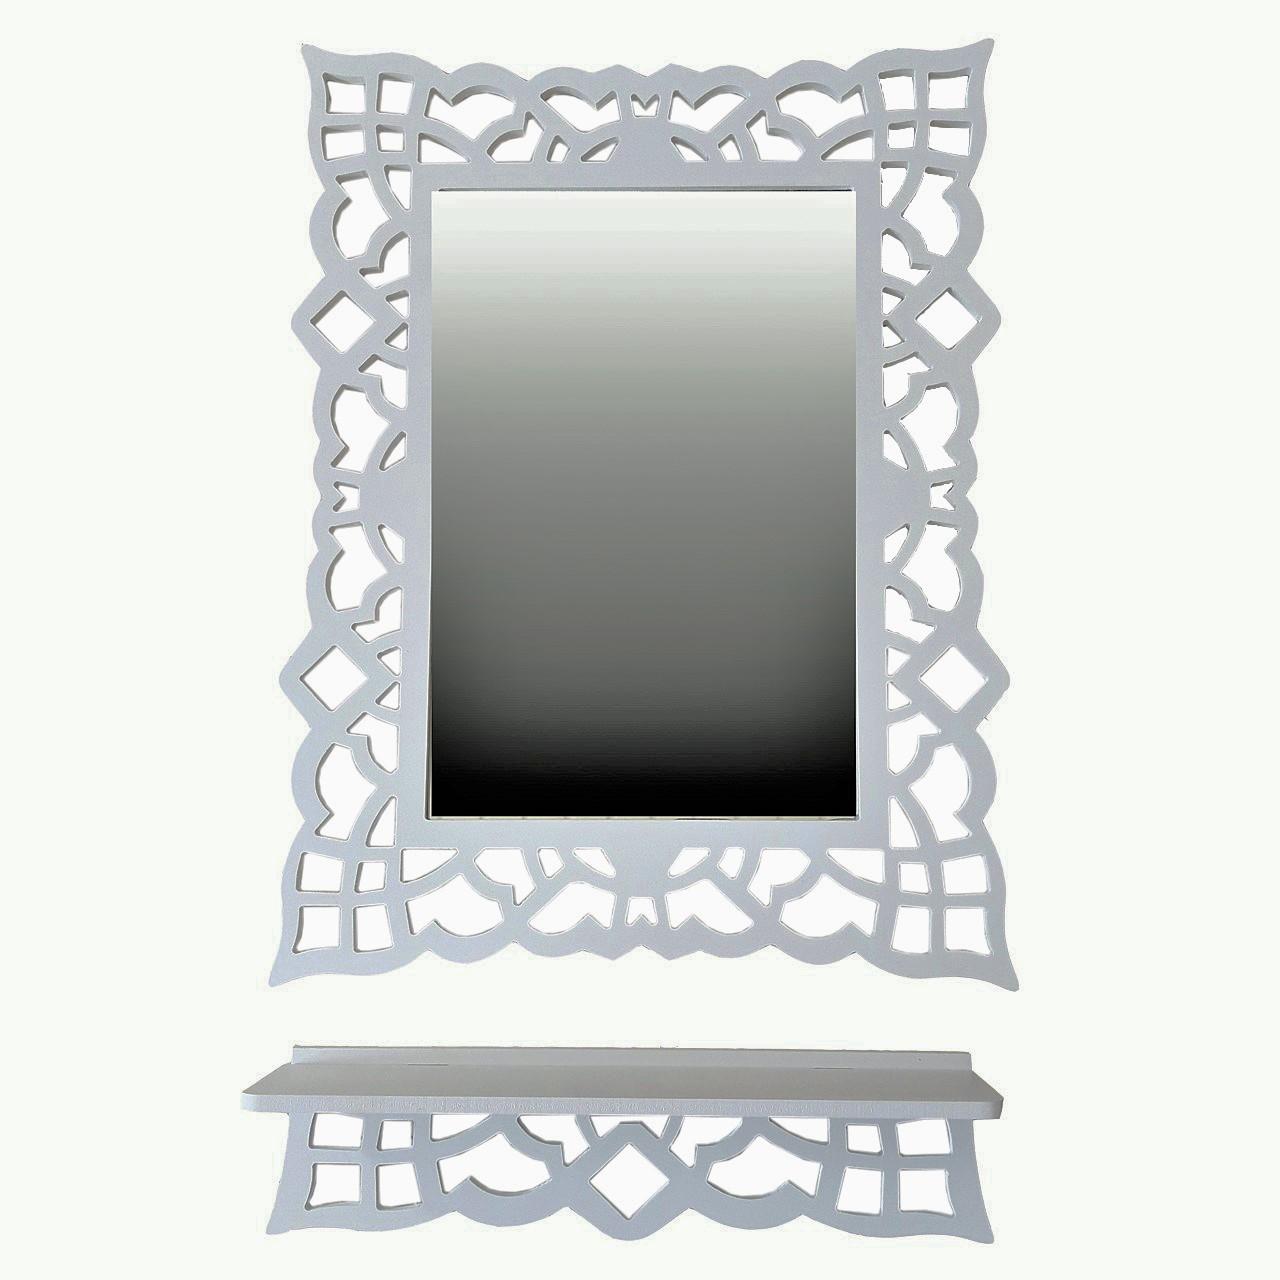 آینه و کنسول خونه خاص مدل Royal